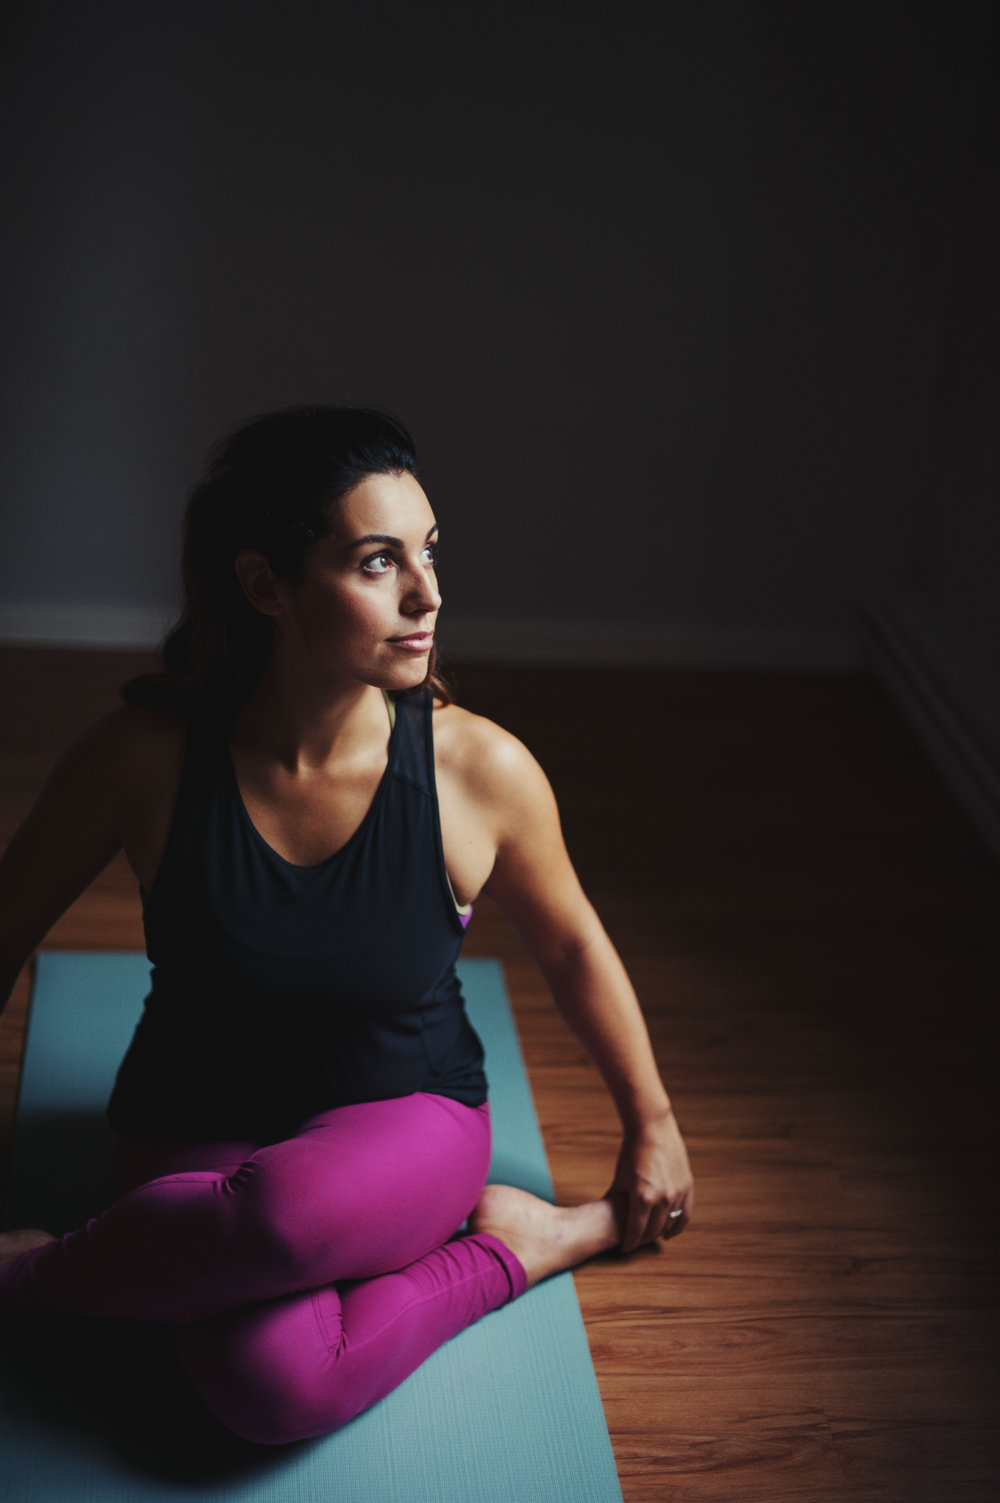 yoga-picture-the-vinyasa-people-katy-scherer-11.jpg